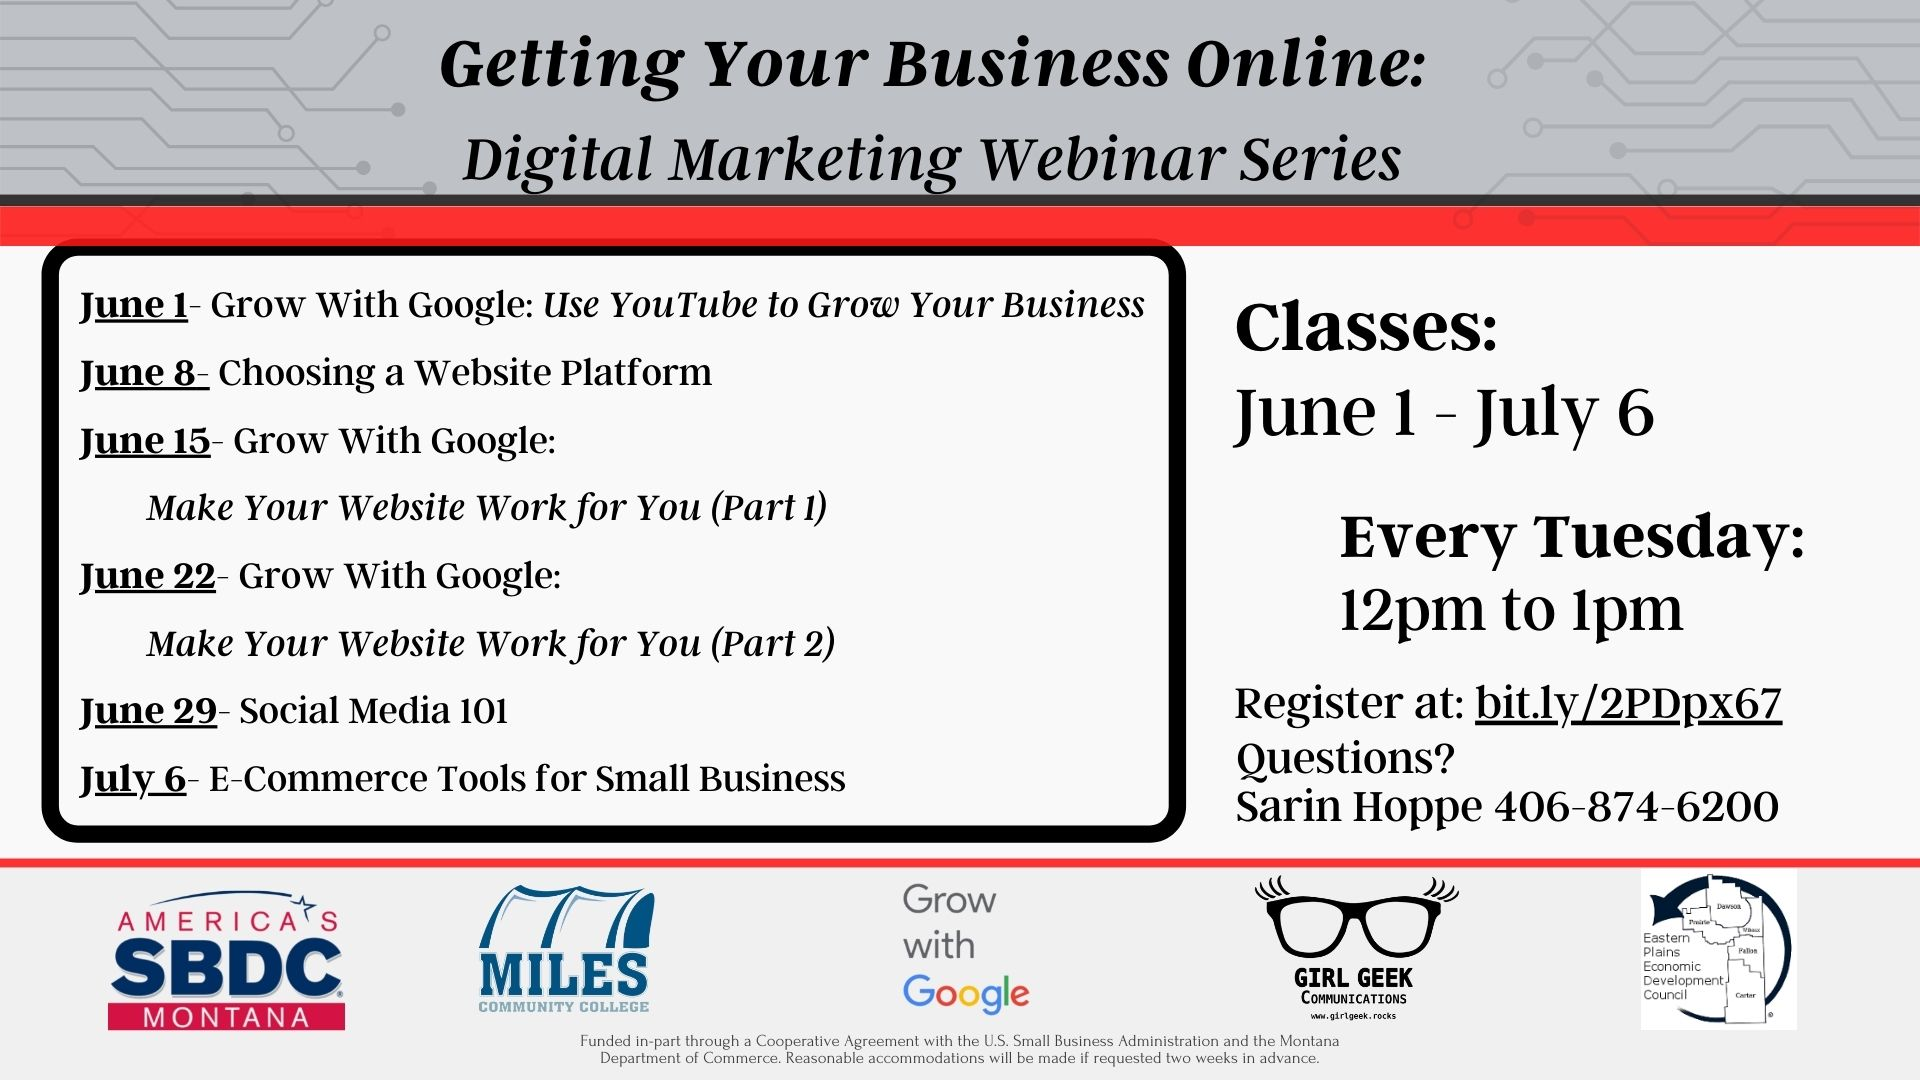 digital marketing webinar series